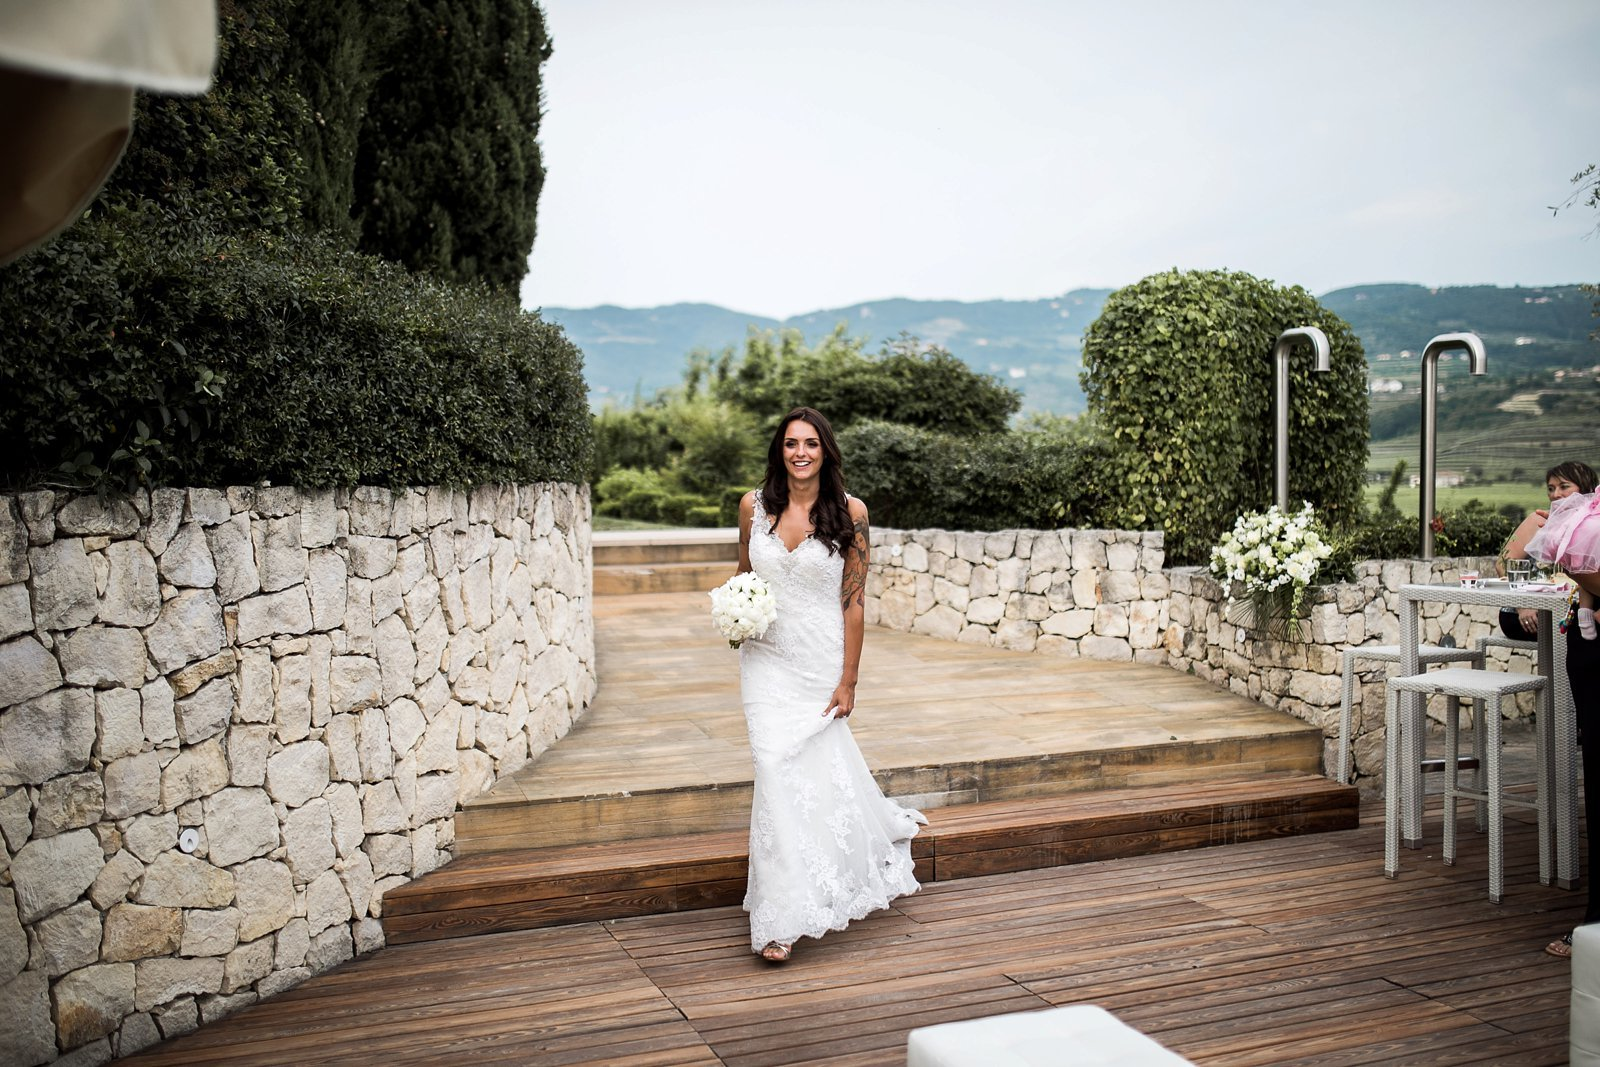 Matrimonio In Verona : Matrimonio relais la magioca verona fotografo matrimonio